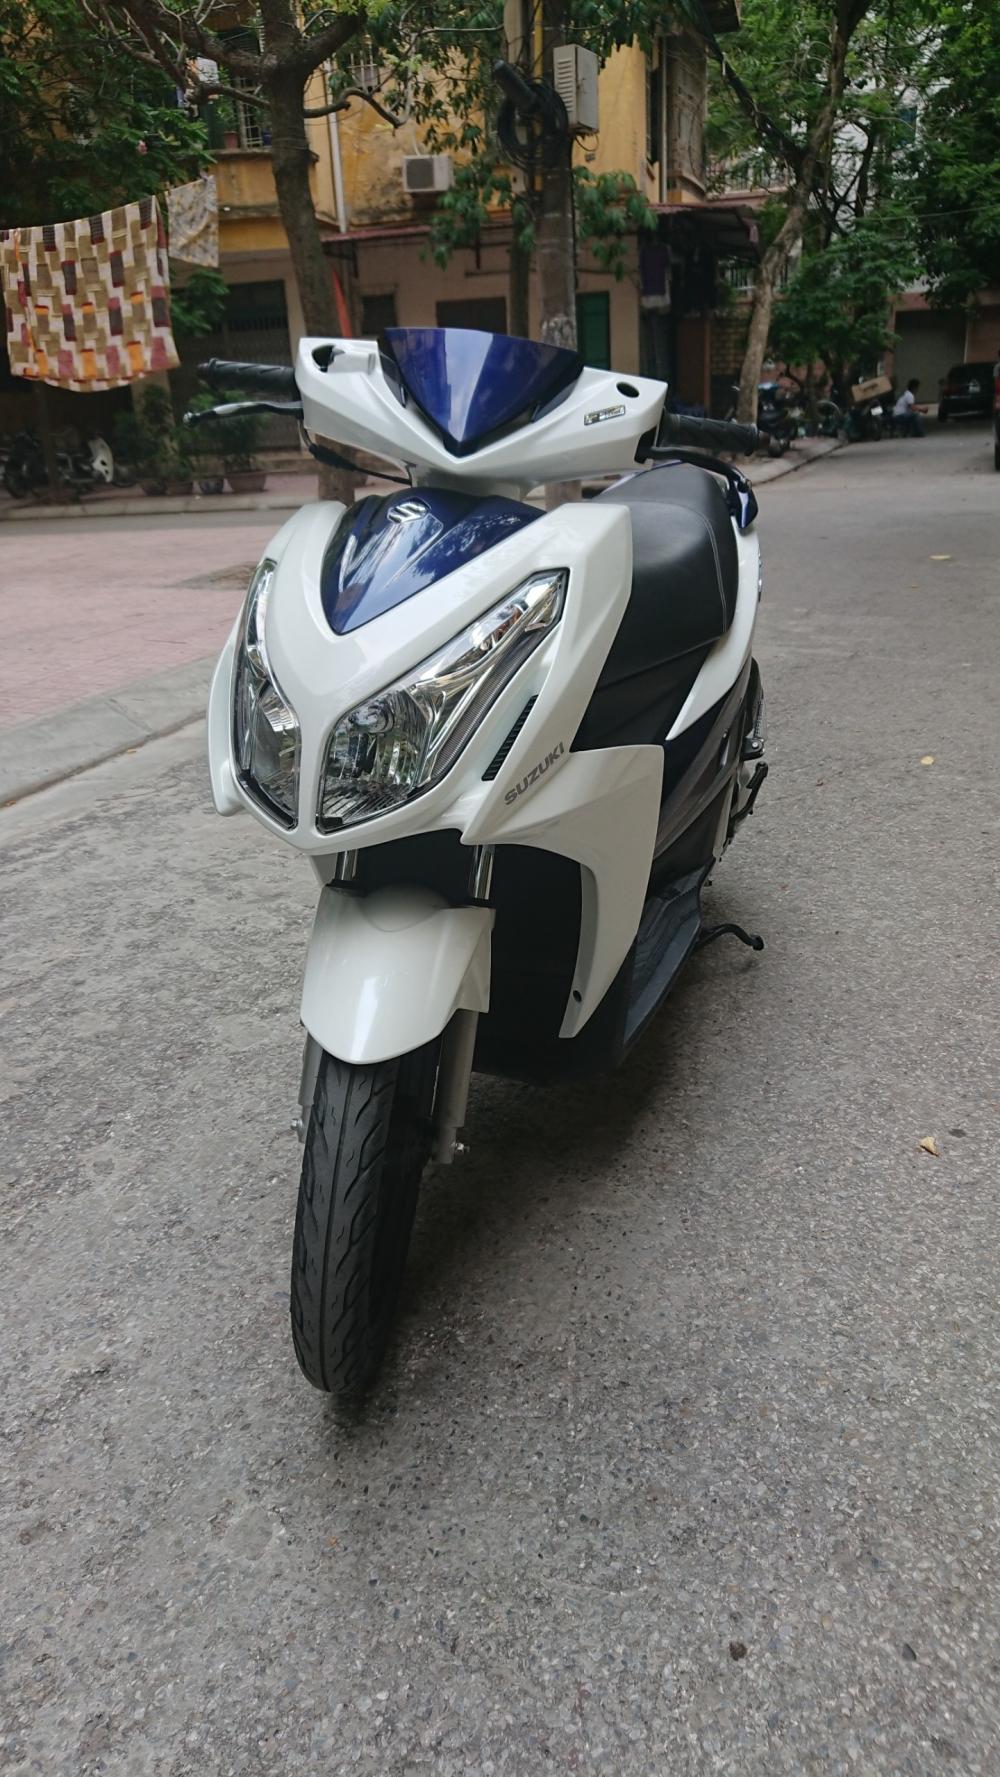 ban xe Suzuki Impulse xanh trang 2015 it dung chinh chu bien HN - 3